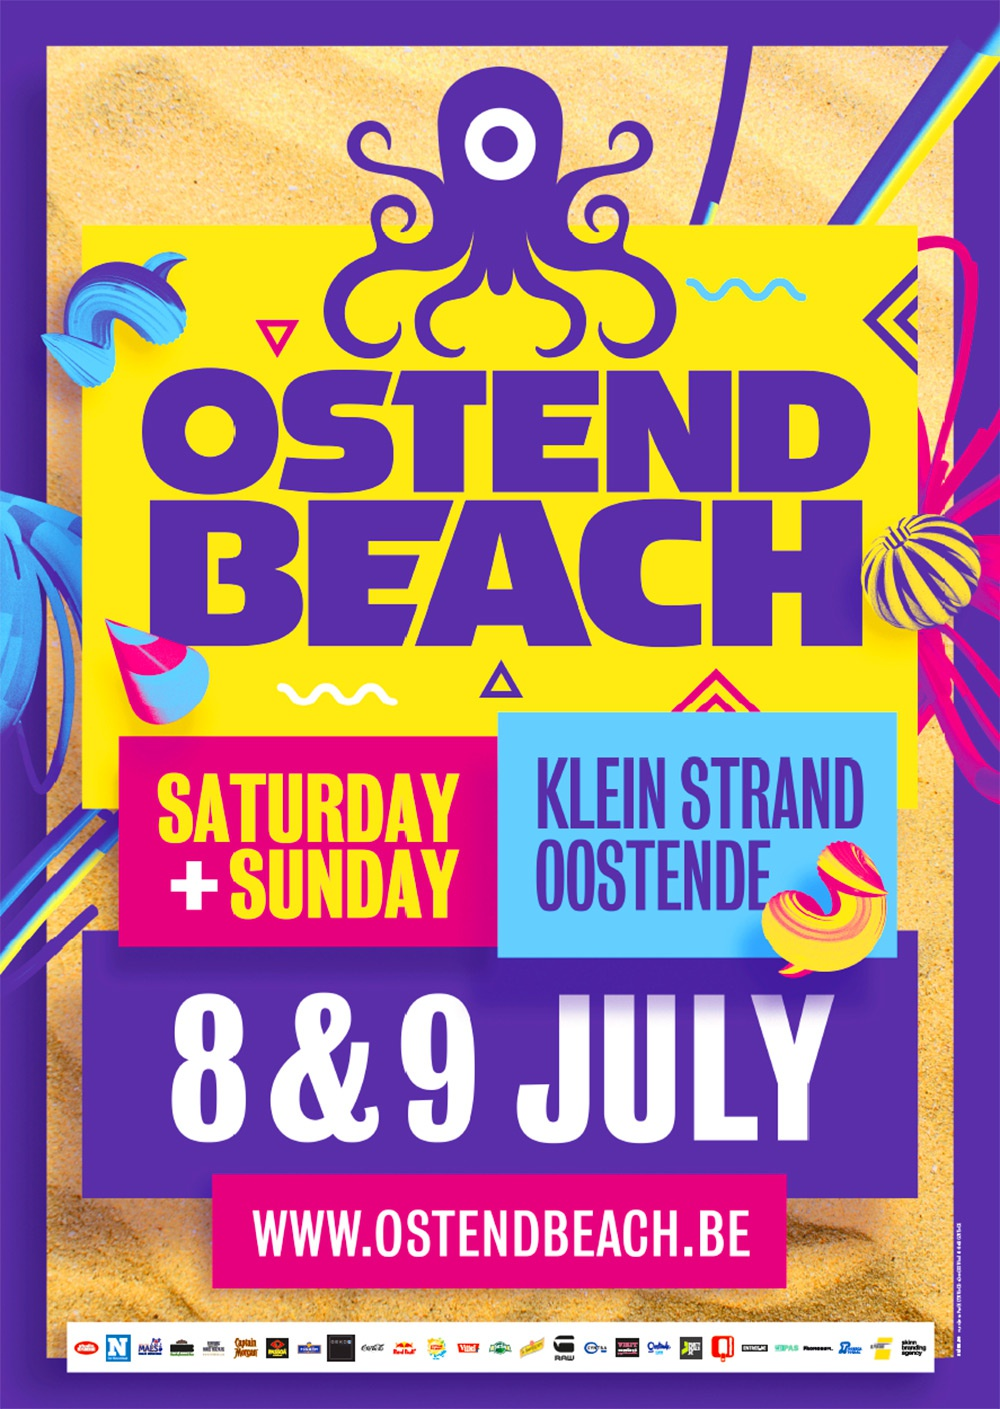 Ostend Beach 2017